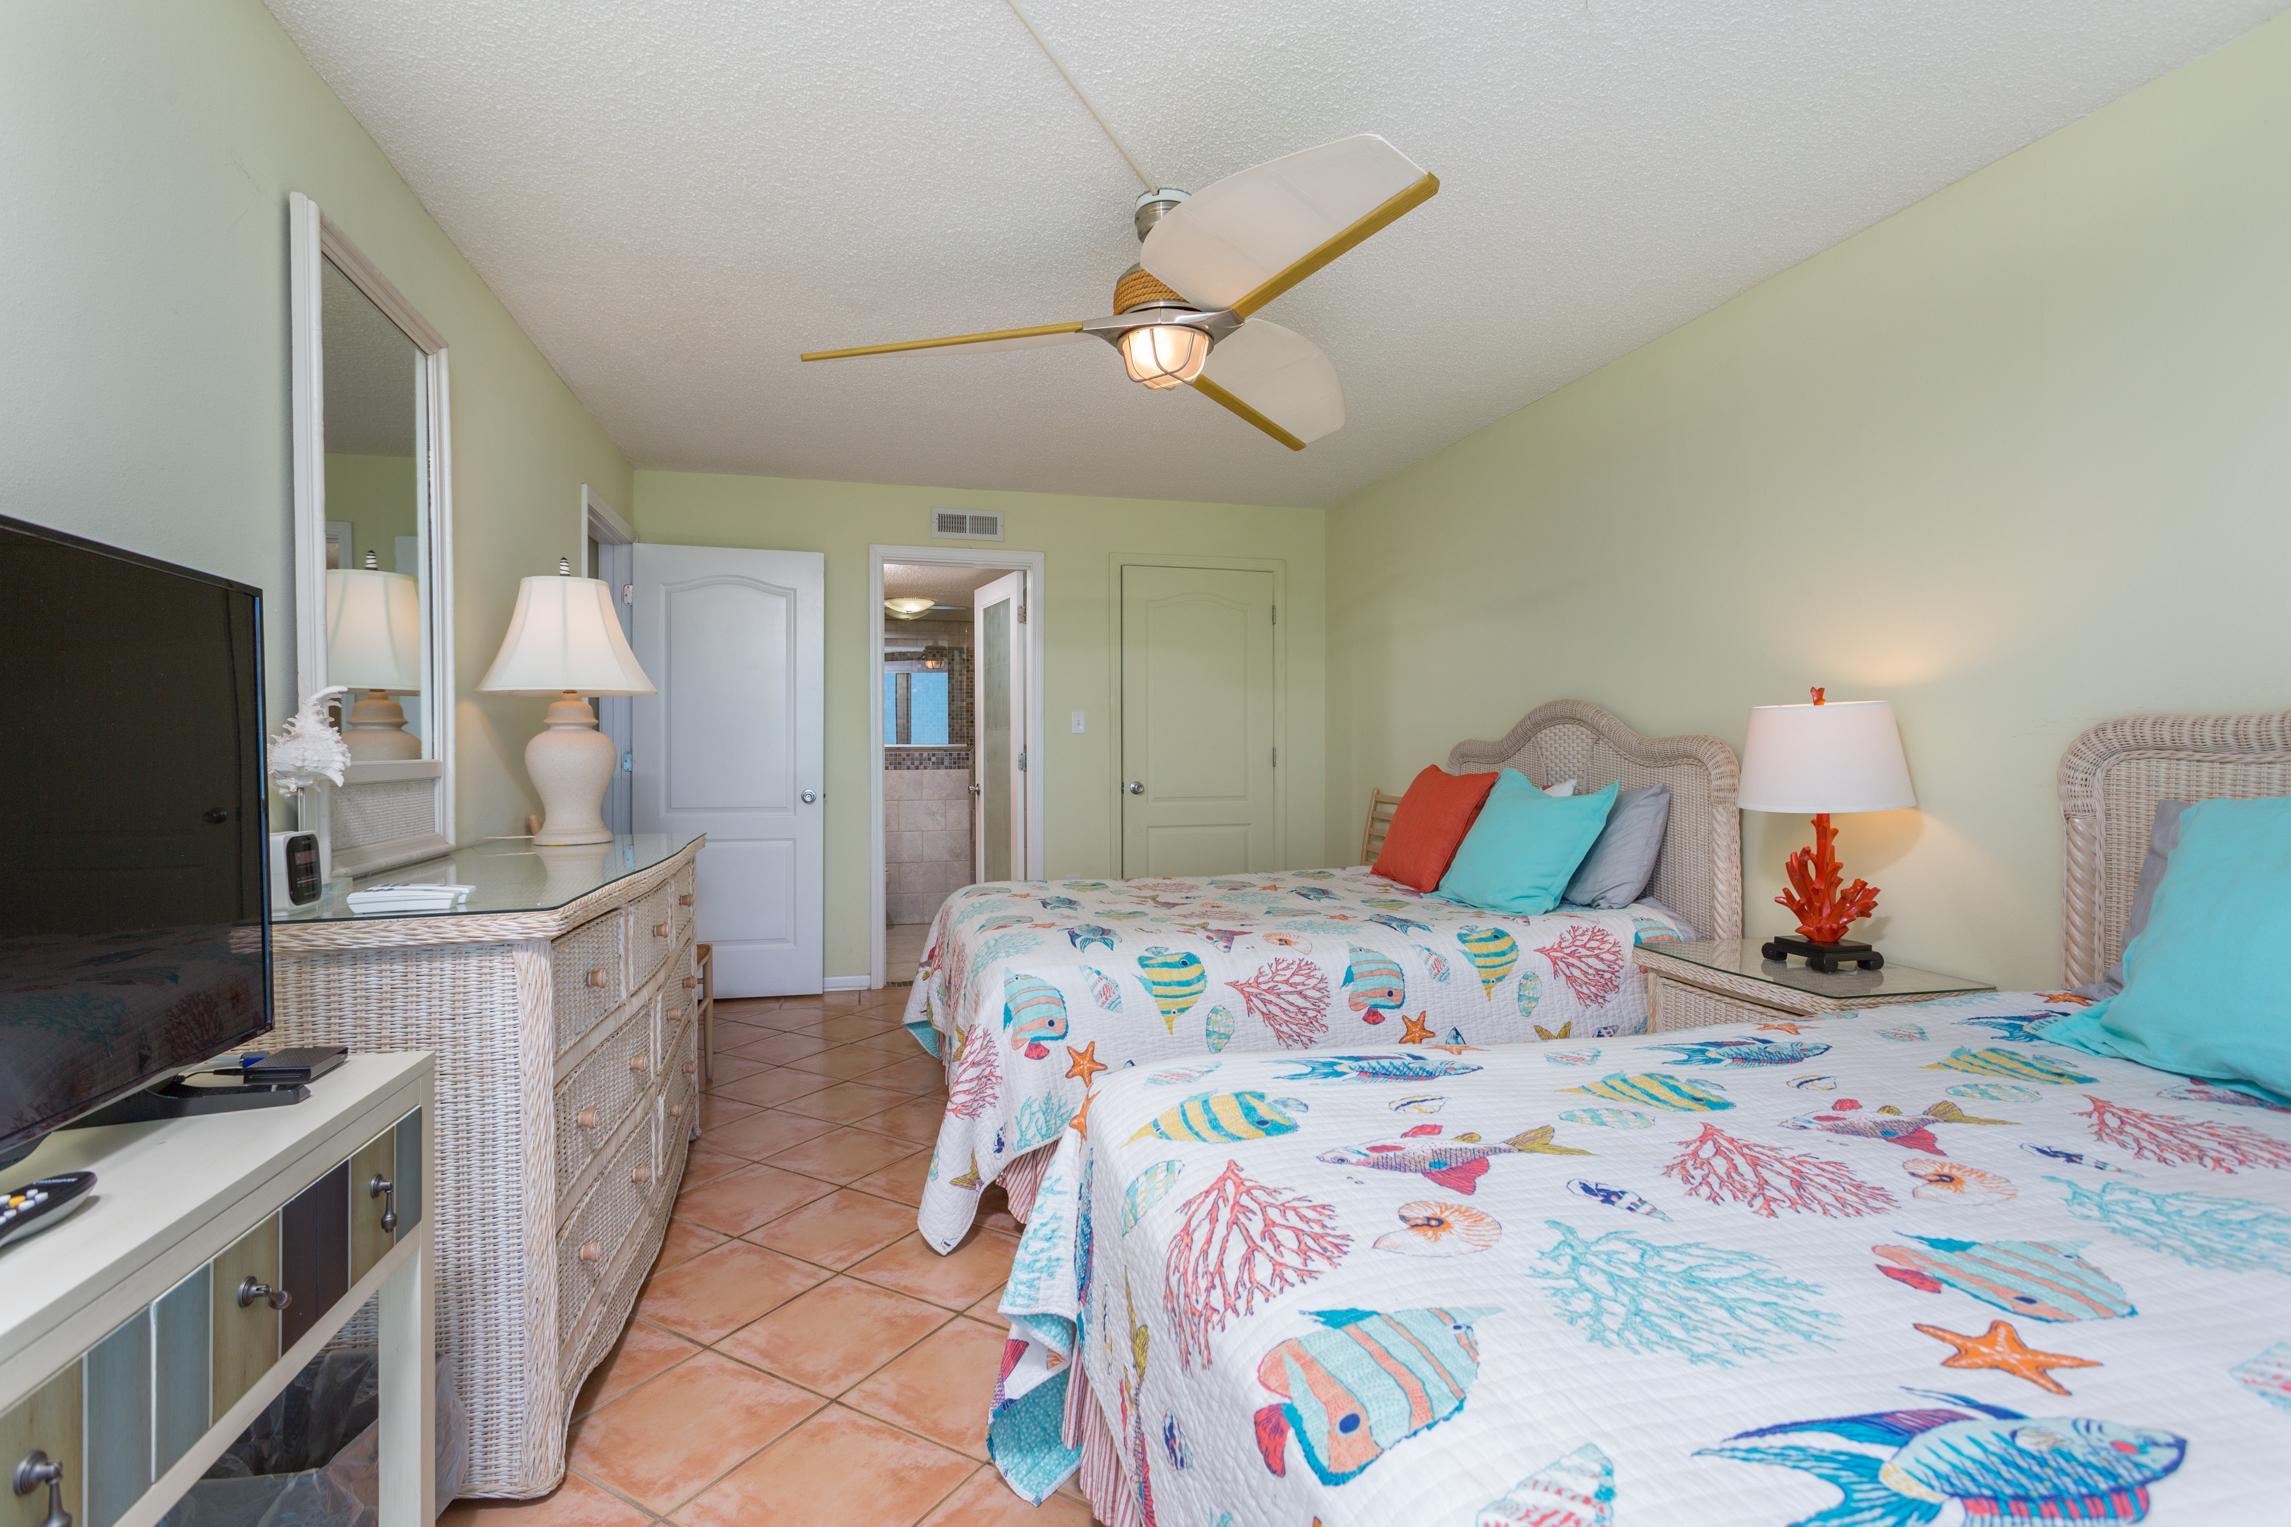 Sabine Yacht & Racquet Club #9D Condo rental in Sabine Yacht & Racquet Club ~ Pensacola Beach Condo Rentals by BeachGuide in Pensacola Beach Florida - #11